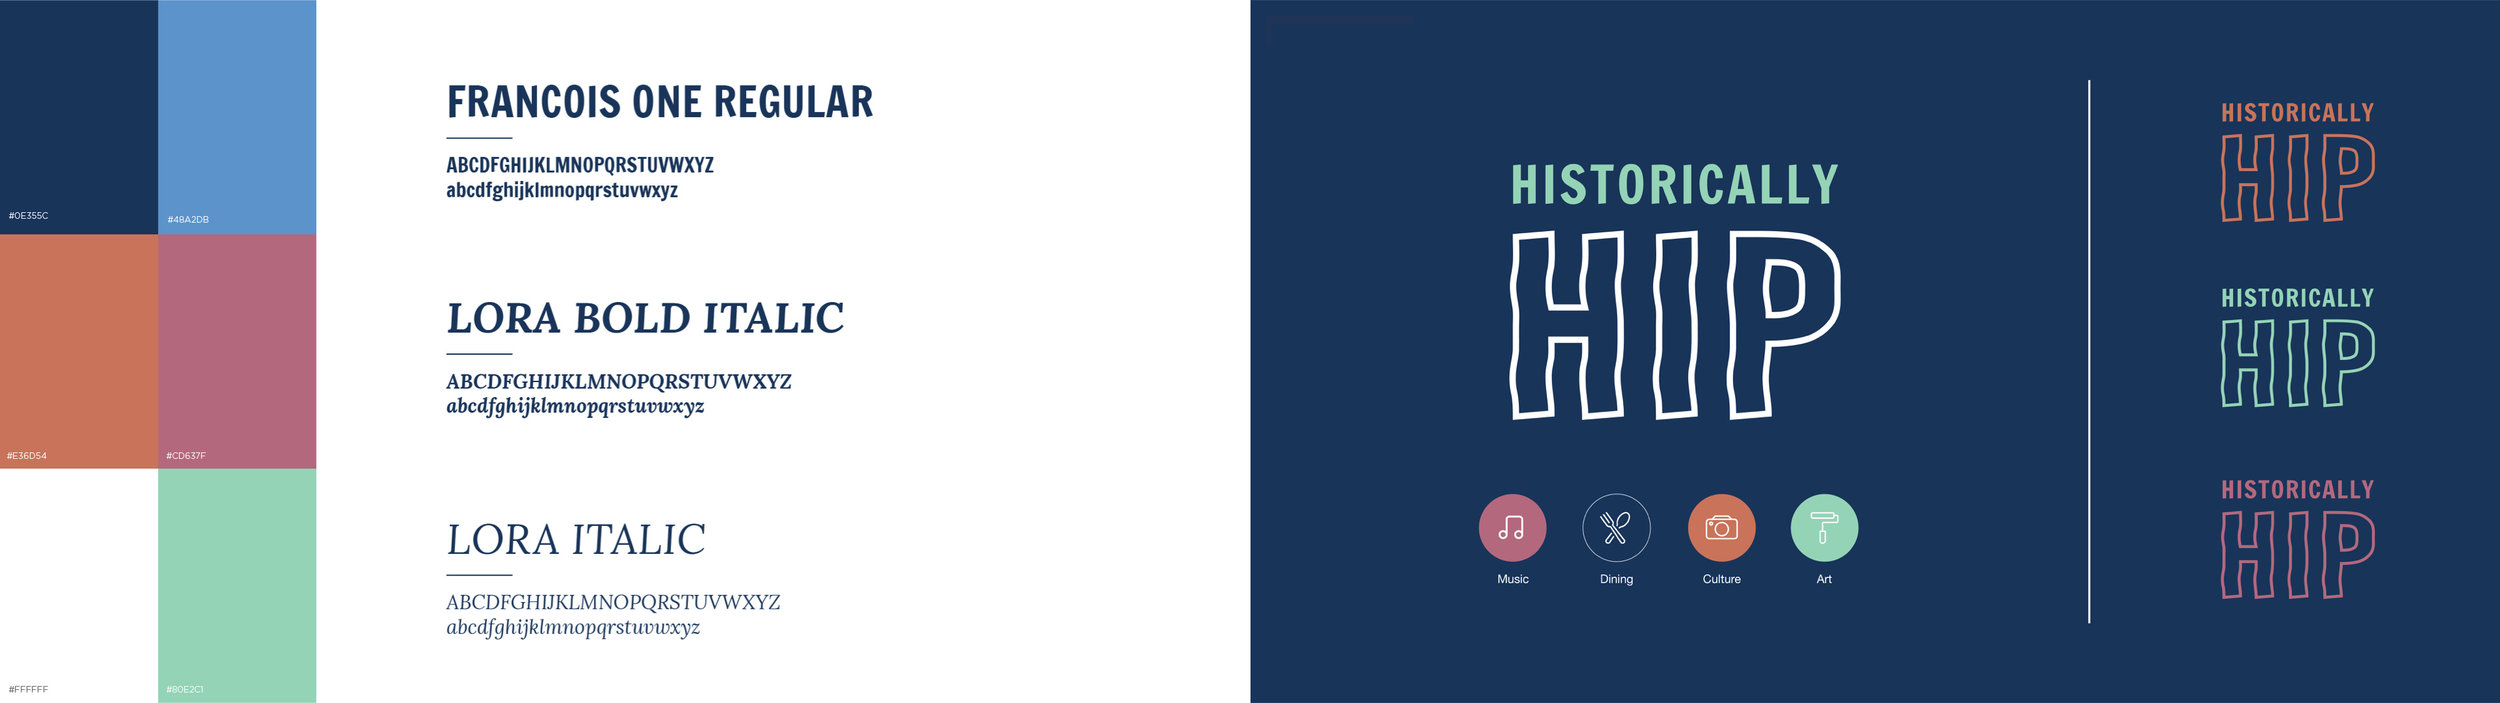 branding_historically_hip.001.jpg